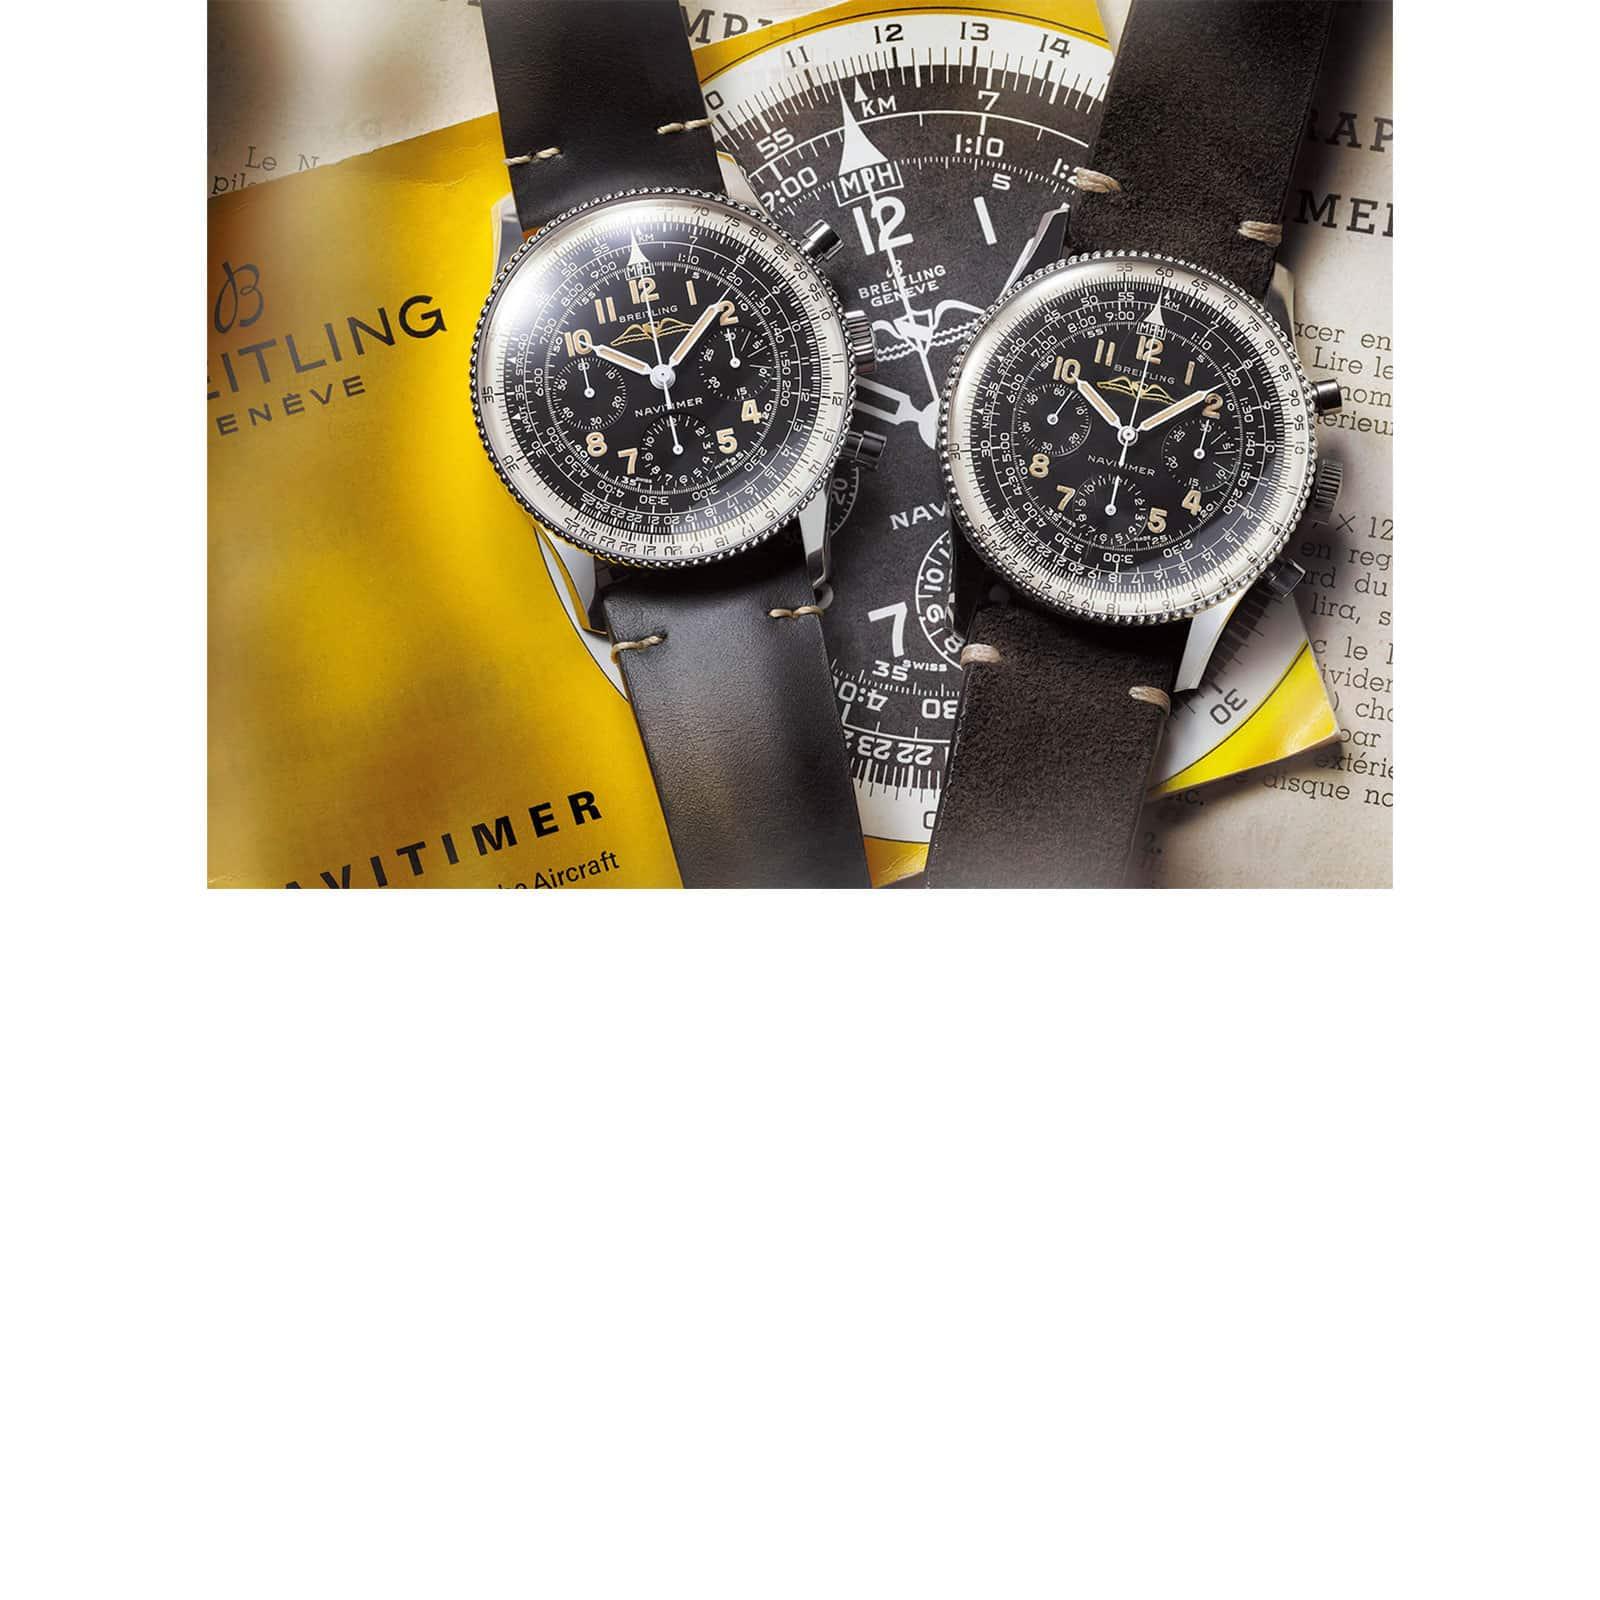 Montre-Breitling-visuel-Lionel-Meylan-horlogerie-joaillerie-vevey.jpg